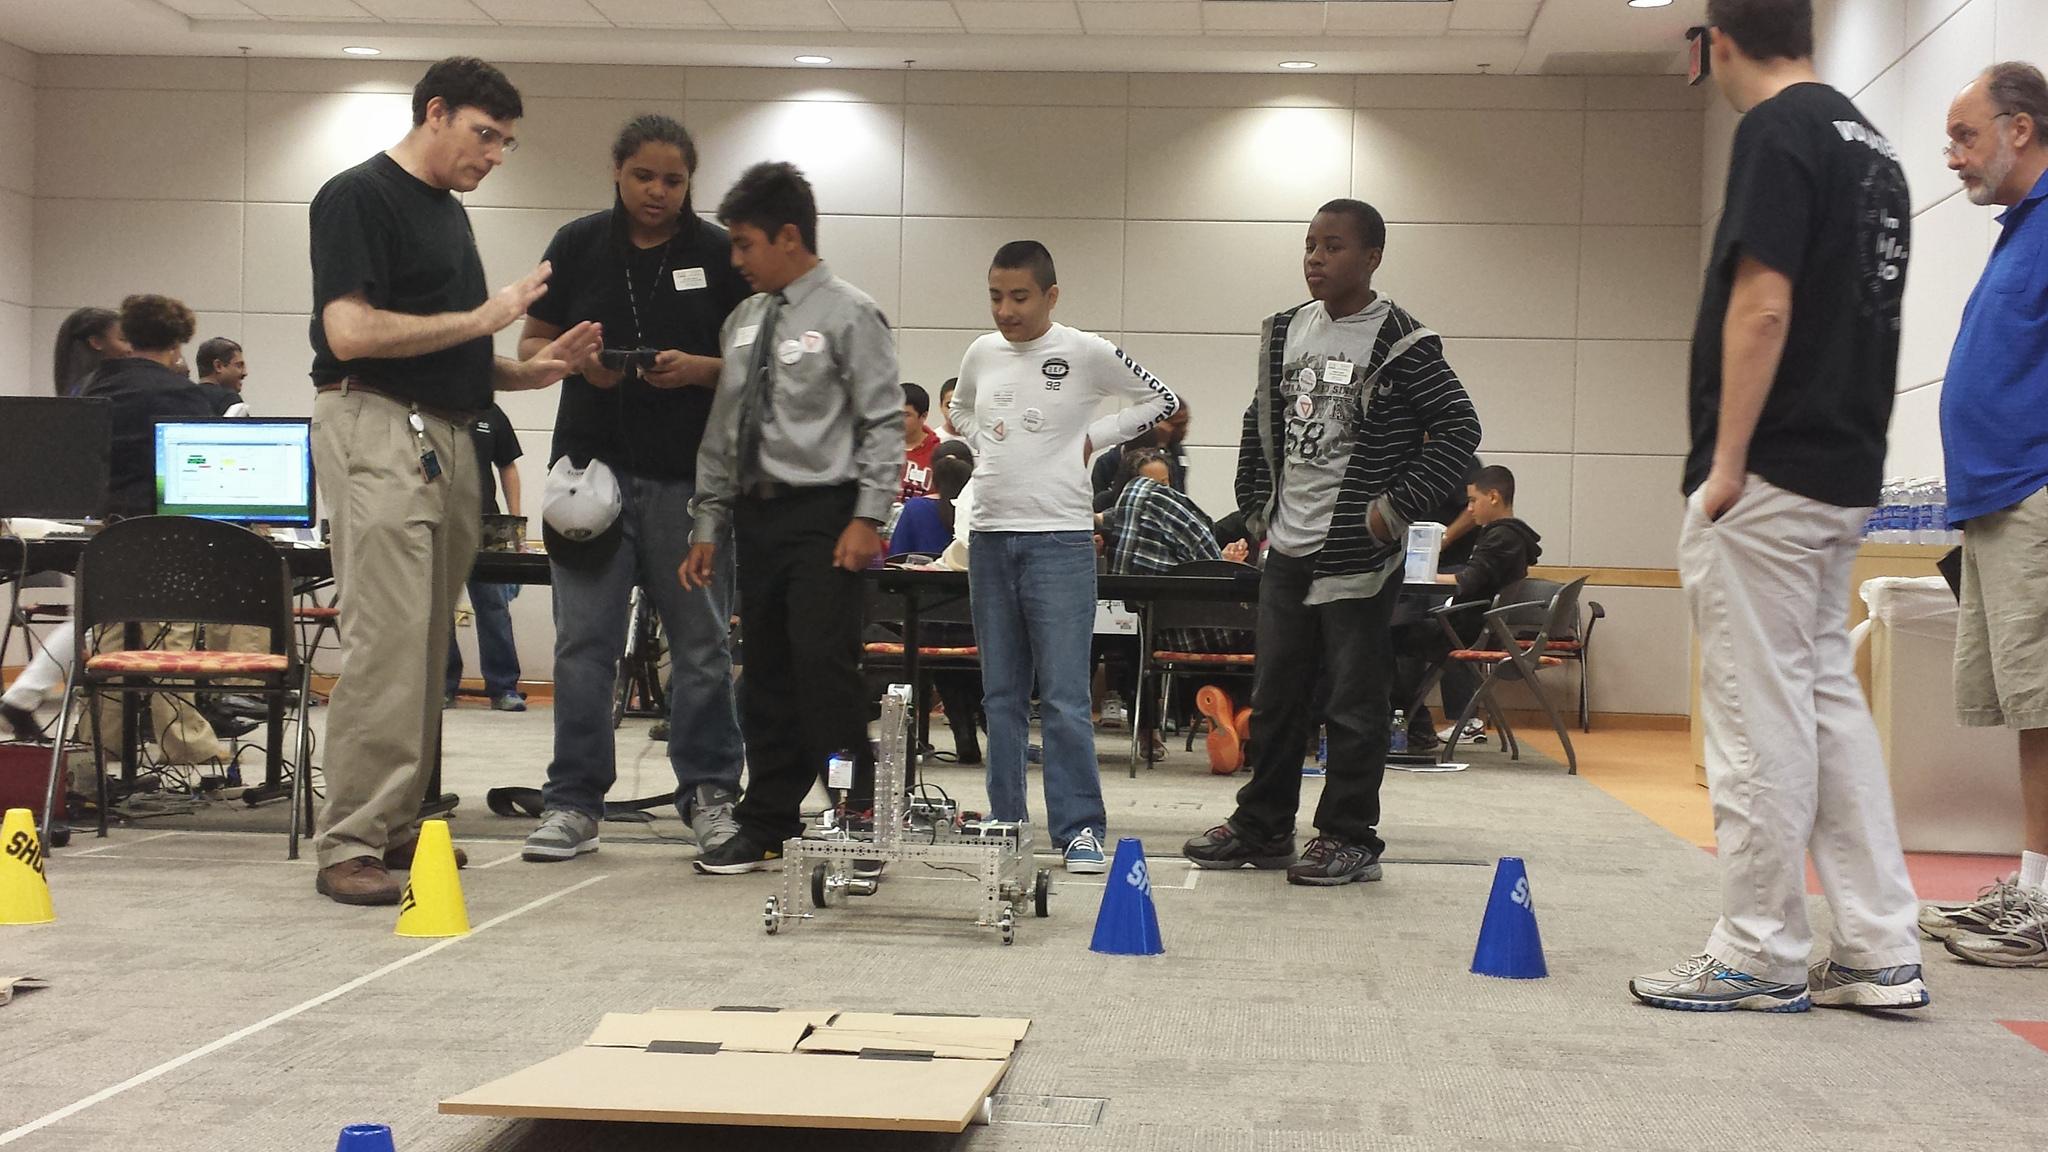 Cisco - Robots - September 26 2013